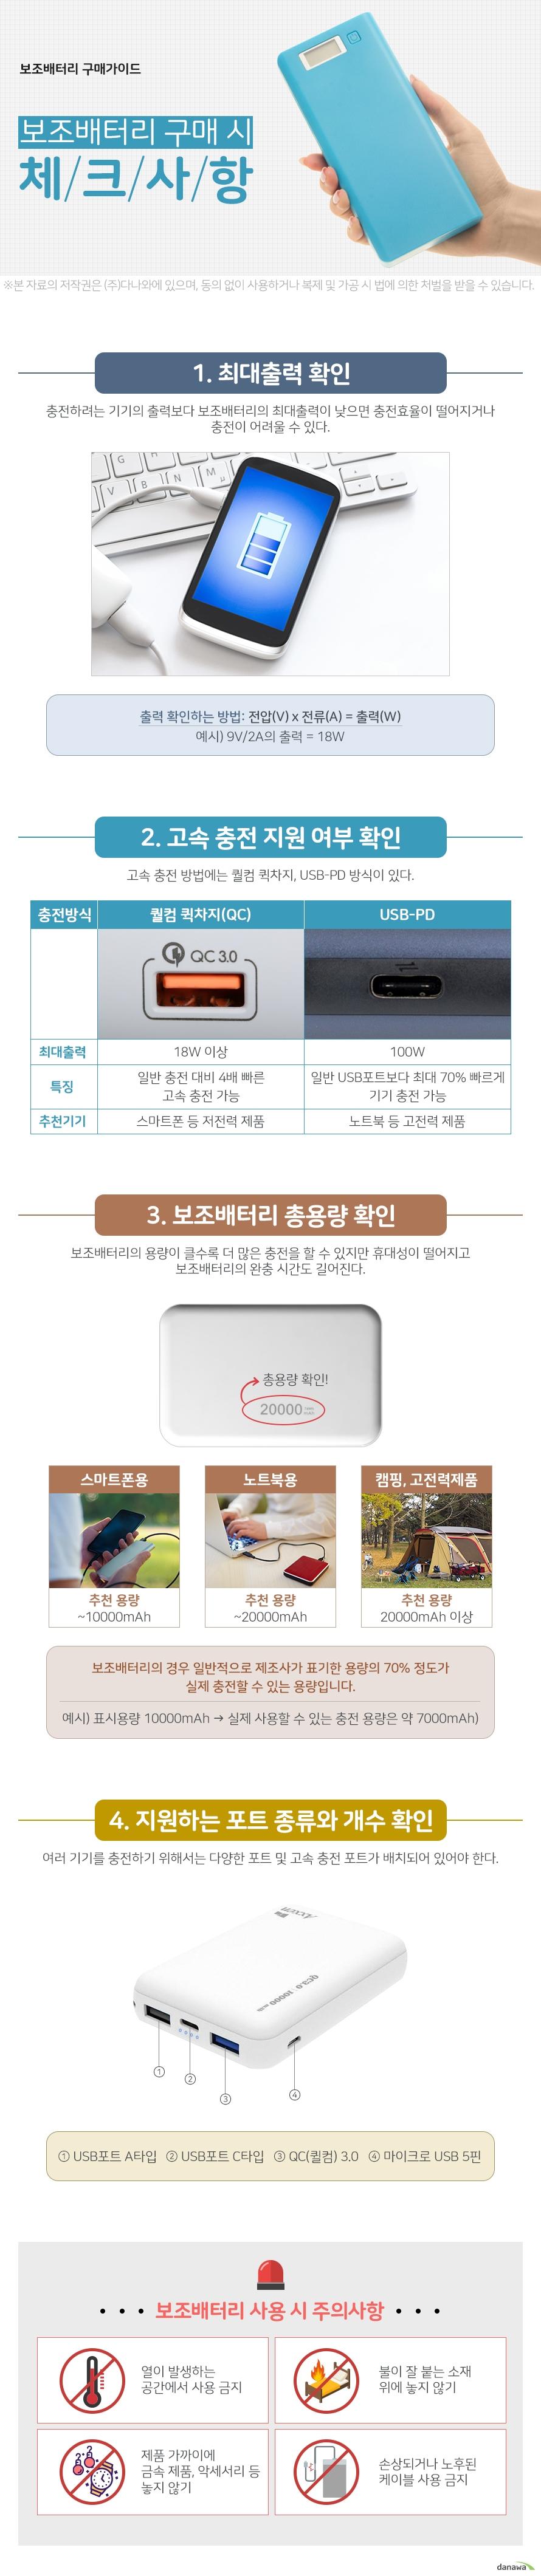 PLEOMAX 2포트 무선 보조배터리 PQW10 10000mAh (정품)